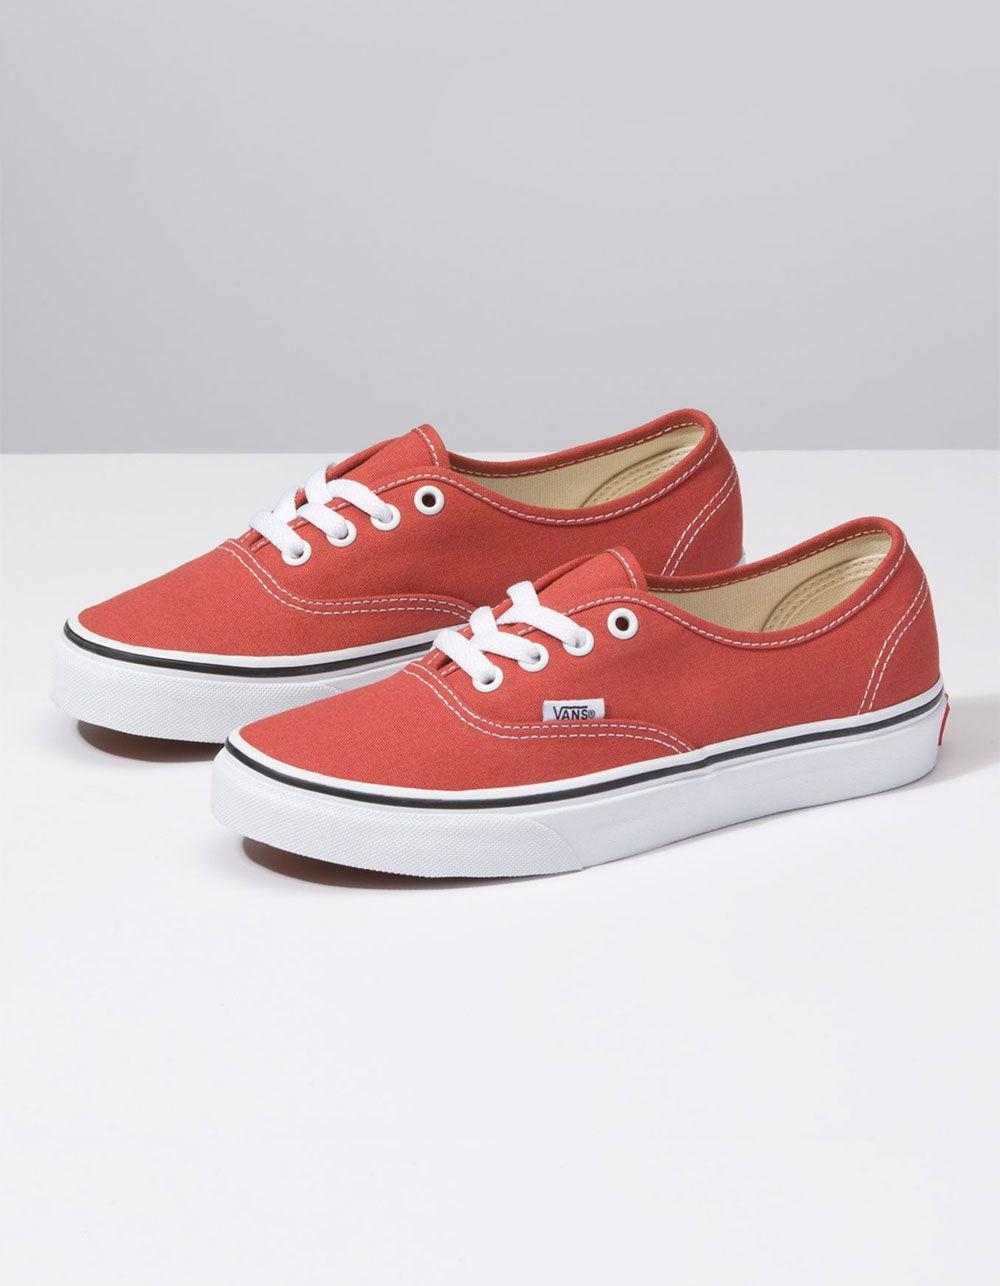 83309cd04268 Lyst - Vans Authentic Hot Sauce   True White Womens Shoes